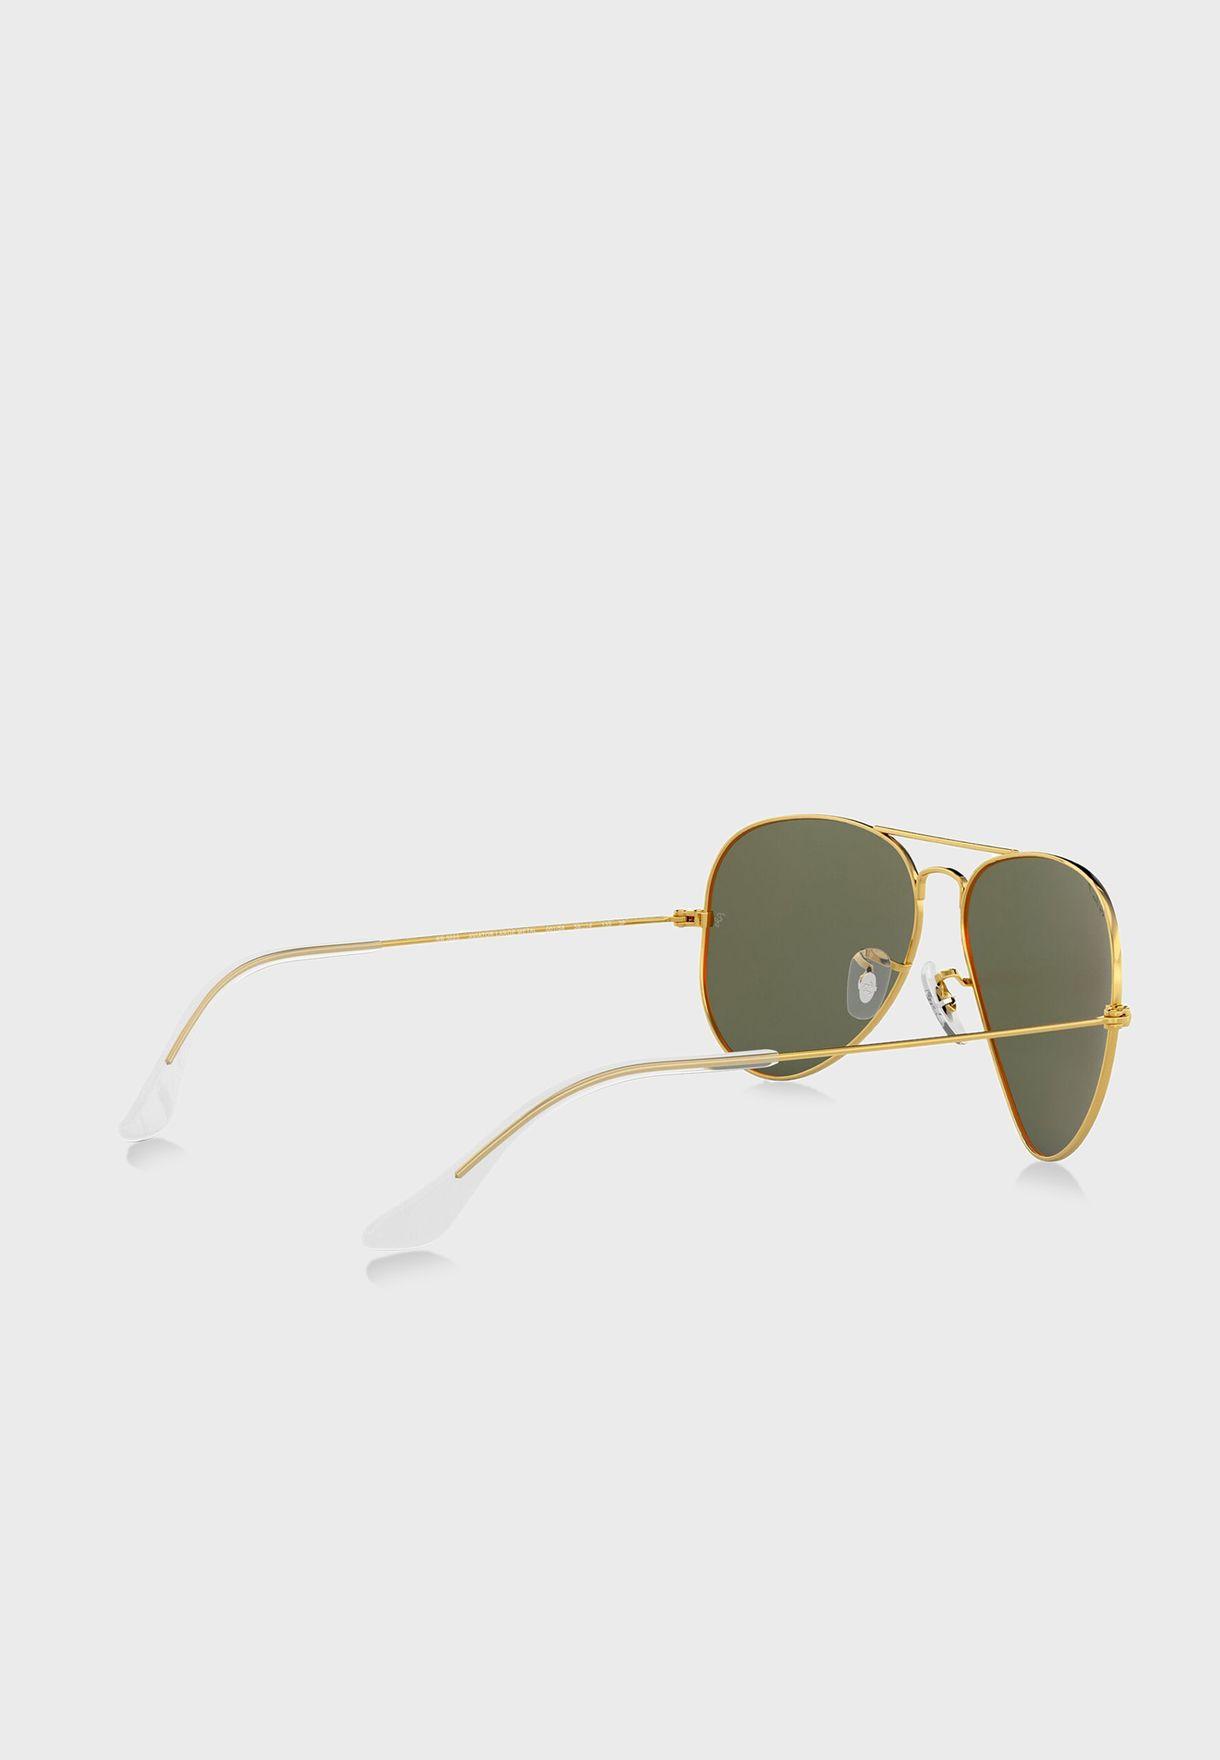 0Rb3025 Aviator Sunglasses